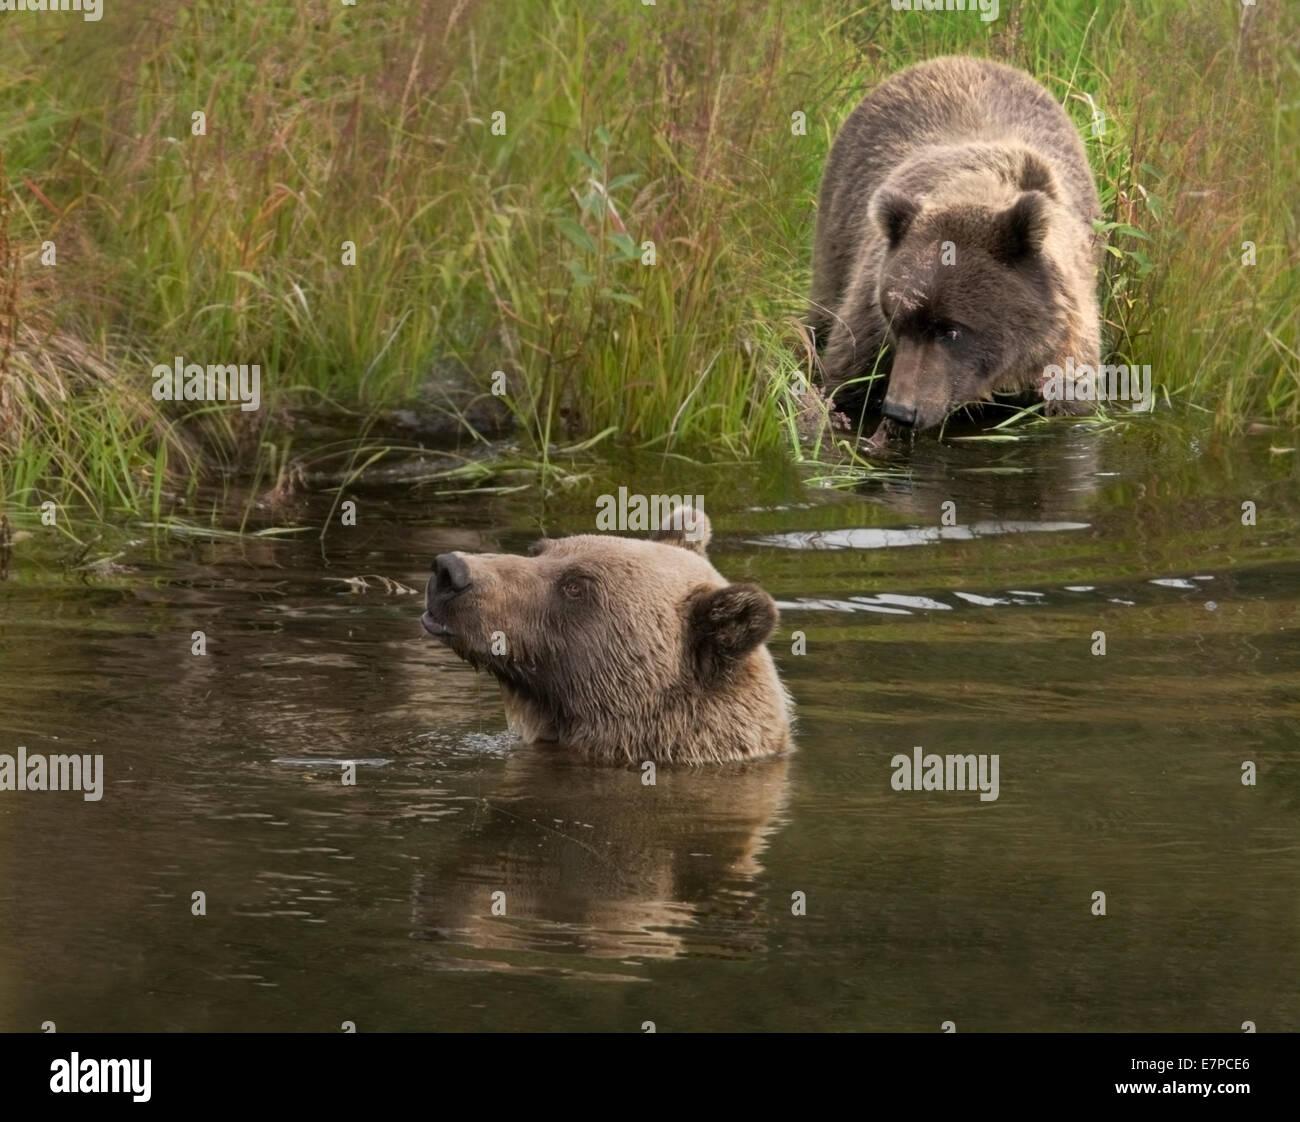 Grizzly Bear sow and yearling cub (Ursus arctos). Denali Nat'l Park, Alaska. - Stock Image